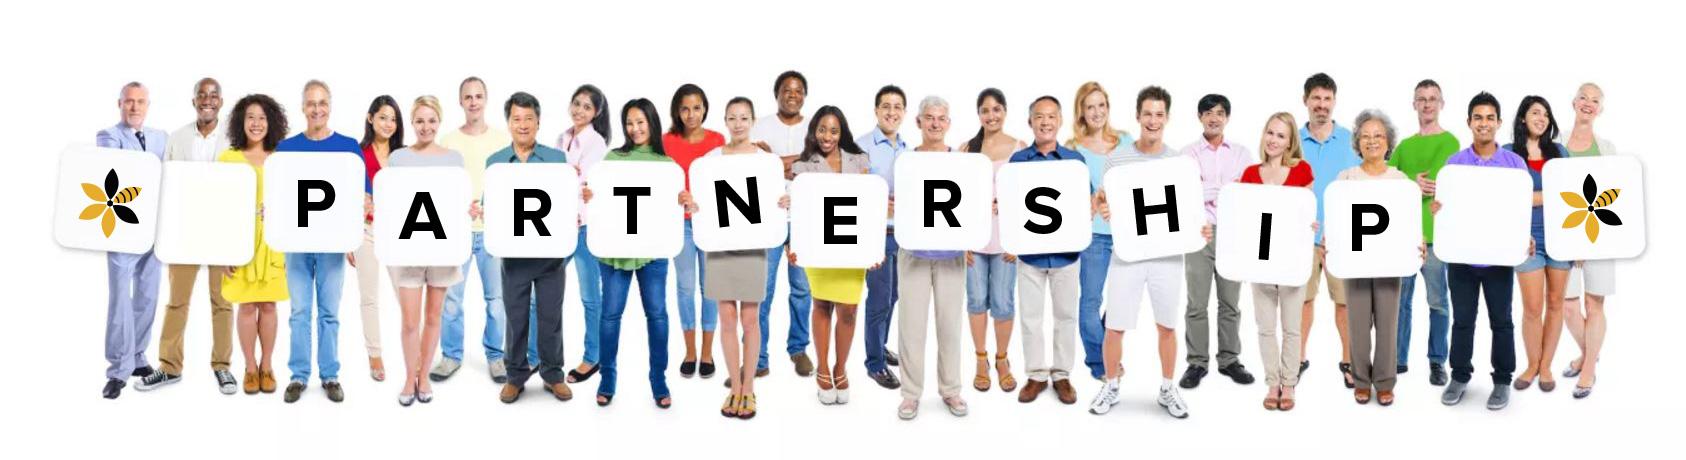 partners-banner